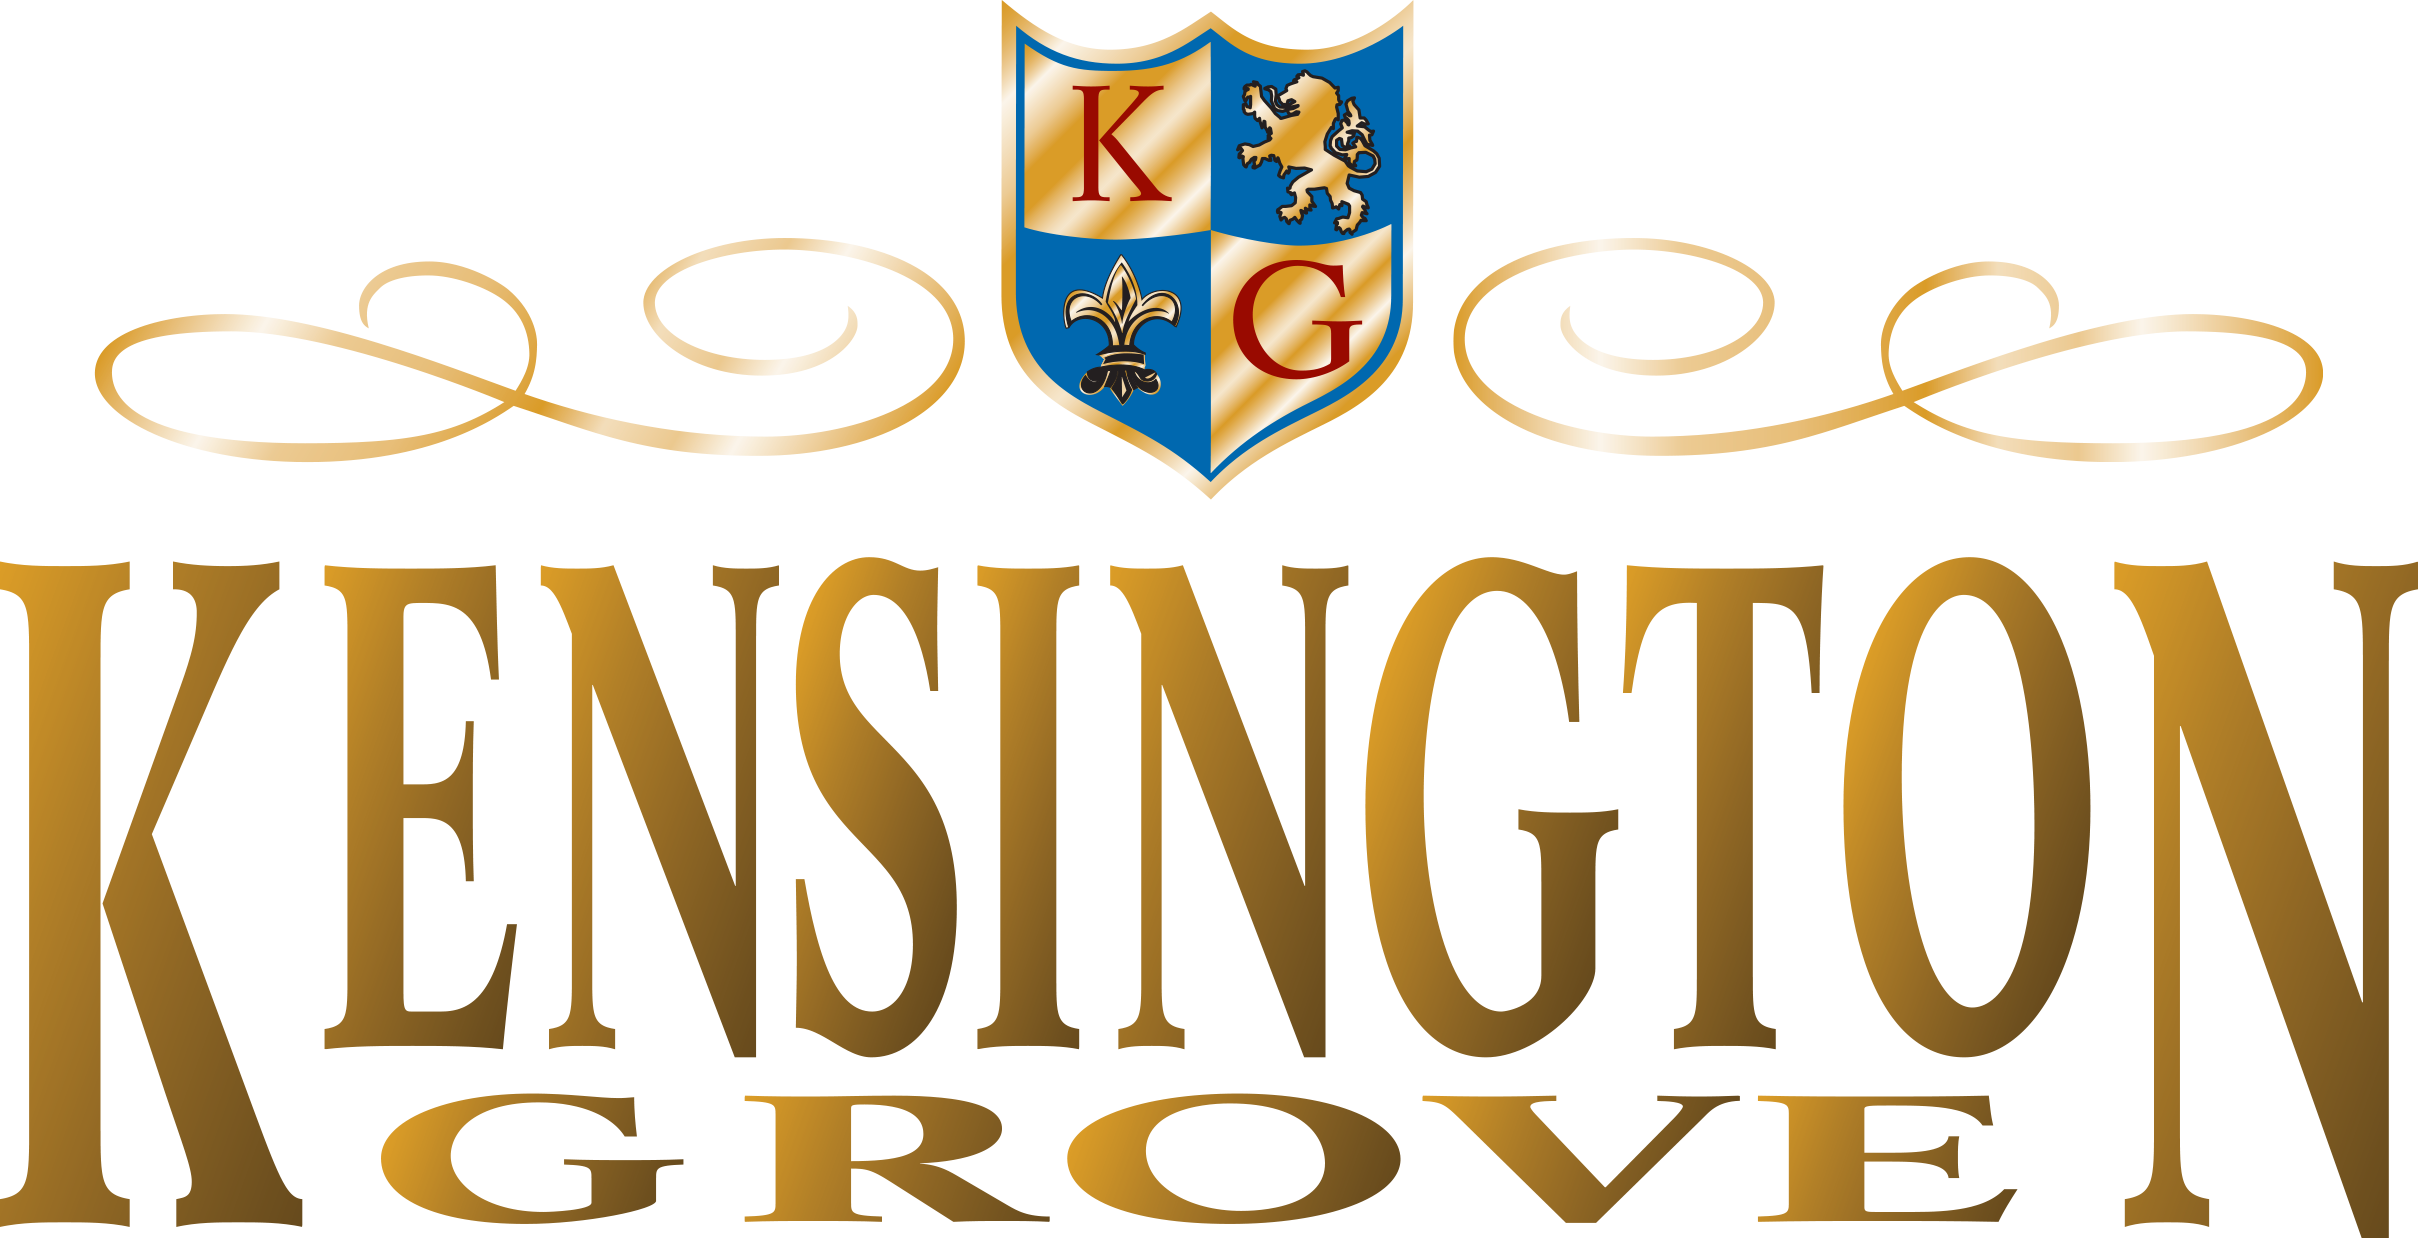 Kensington Grove